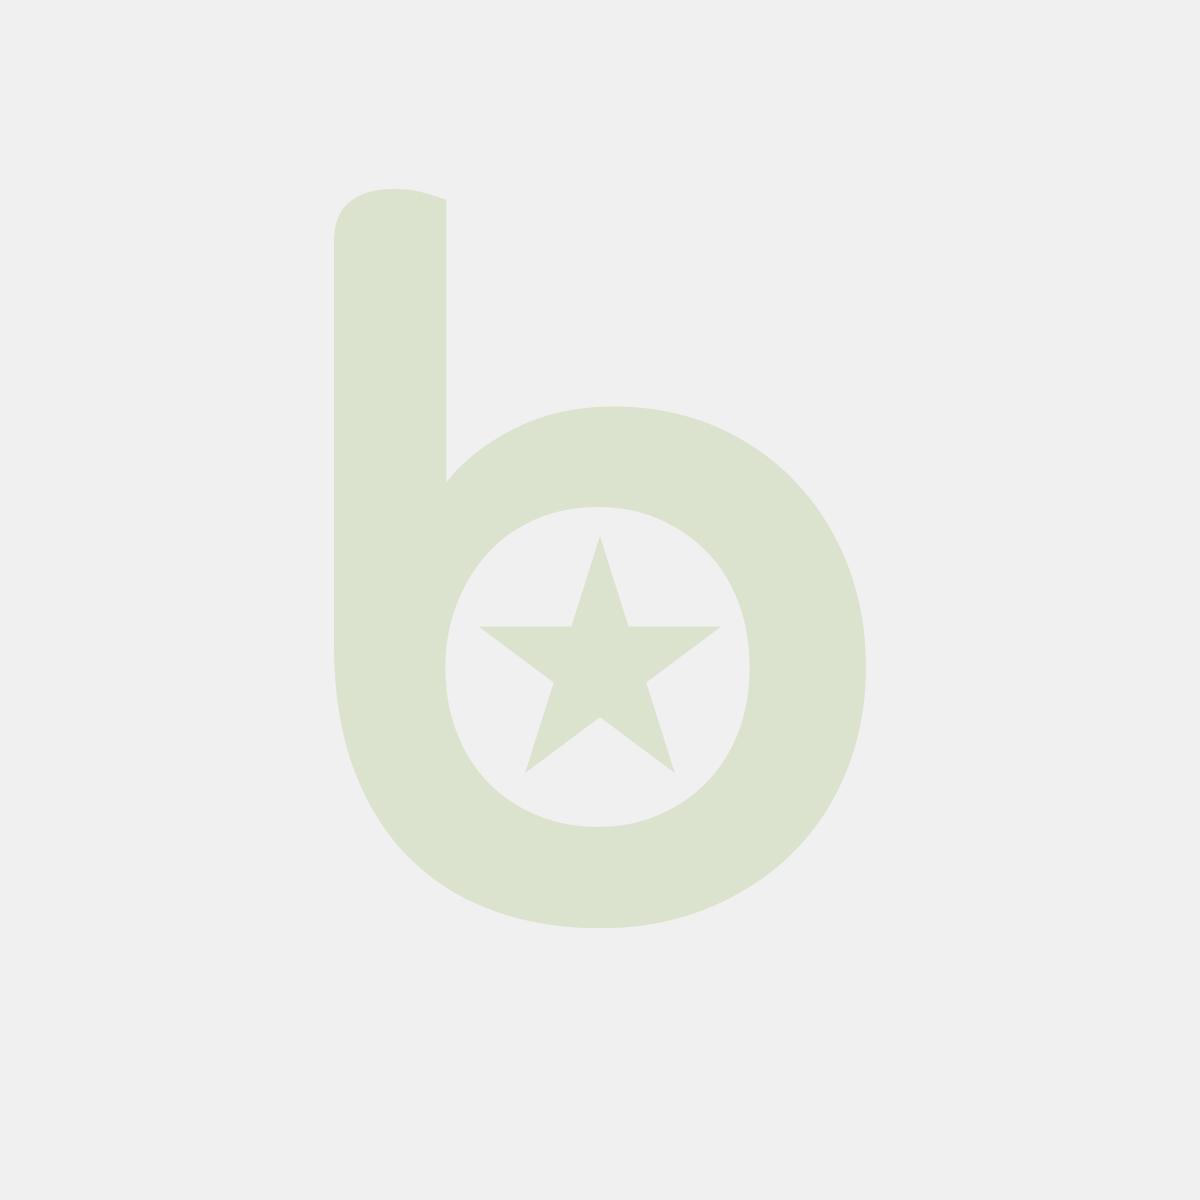 Koperty samoklejące (SK) NC, 25 sztuk, białe, DL, 11221000